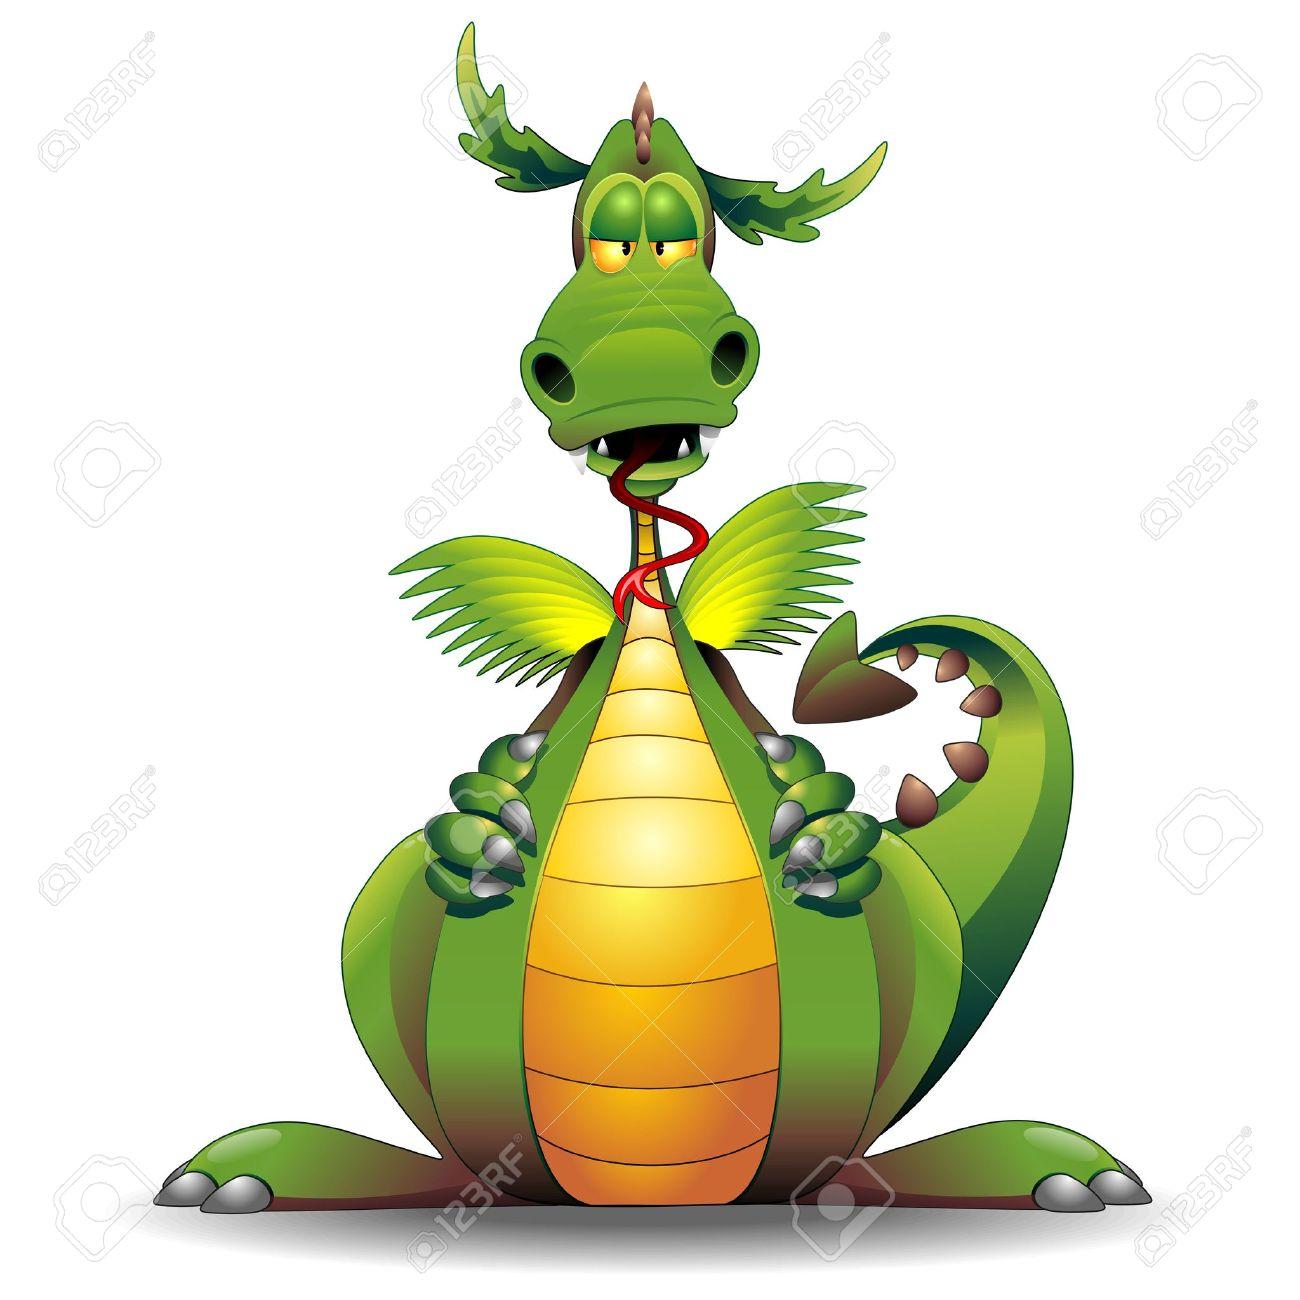 Dragon Funny Cartoon Character Stock Vector - 18546230